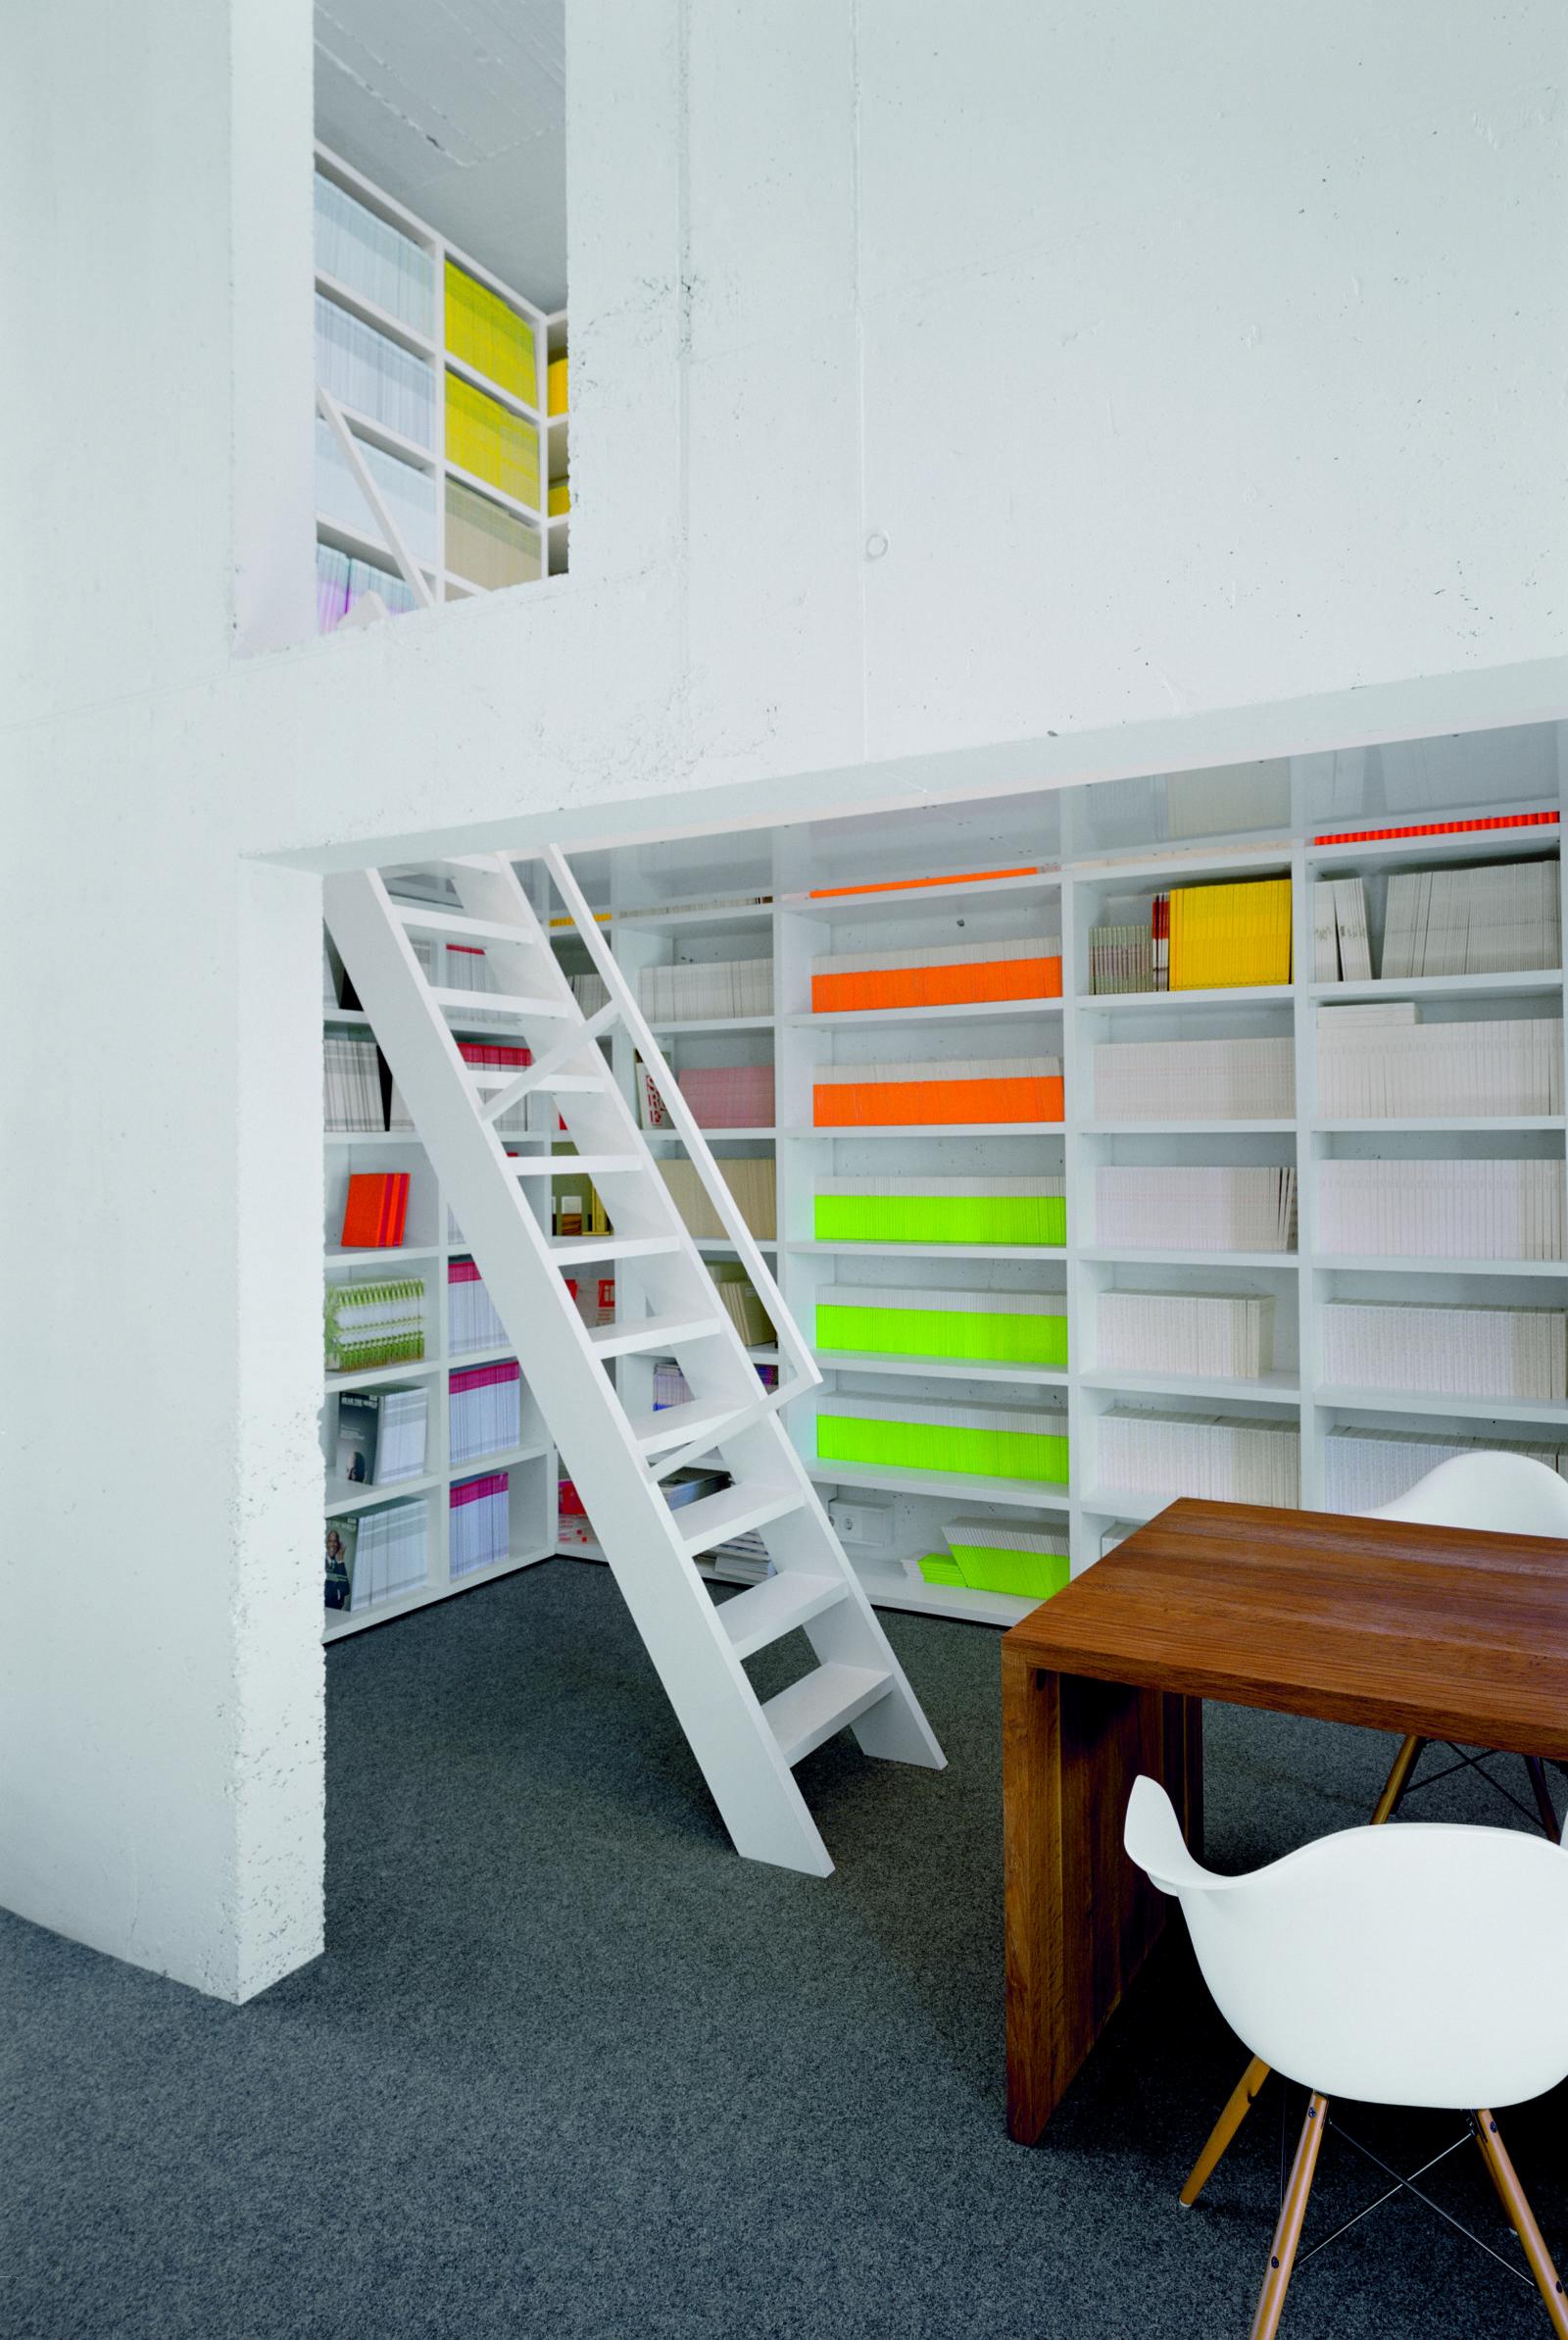 sign kommunikation frankfurt am main philipp mainzer. Black Bedroom Furniture Sets. Home Design Ideas